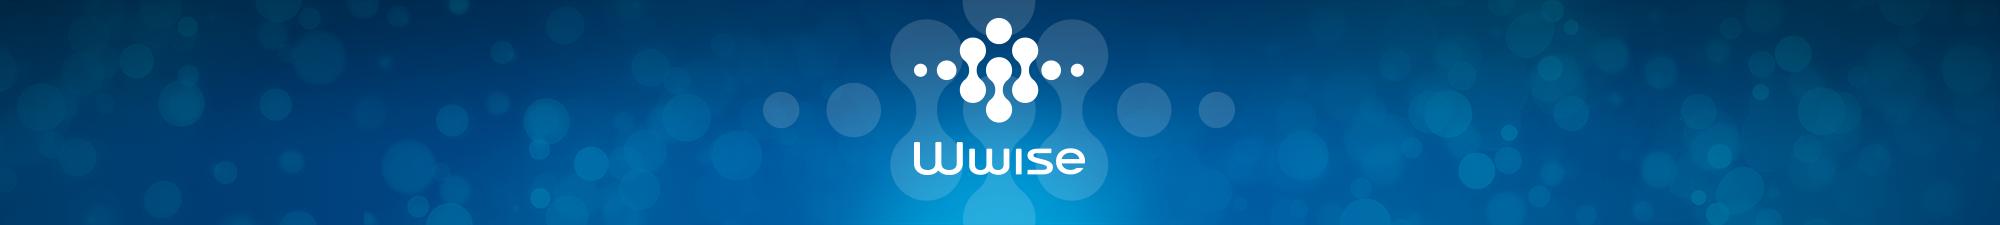 AUDIO-Entetes2020-2000x225-Wwise-03